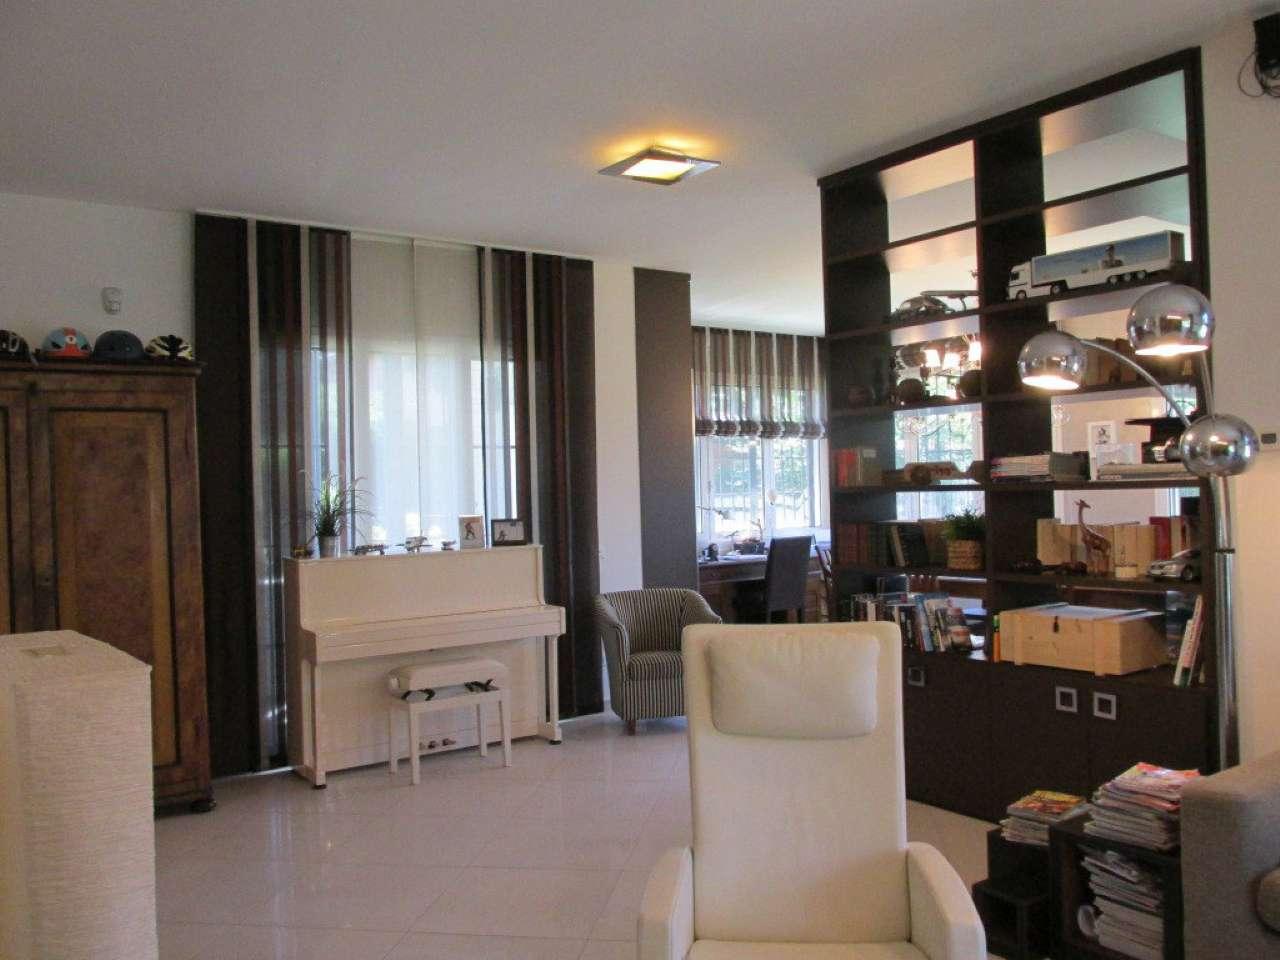 Villa in Vendita a Segrate: 5 locali, 300 mq - Foto 4